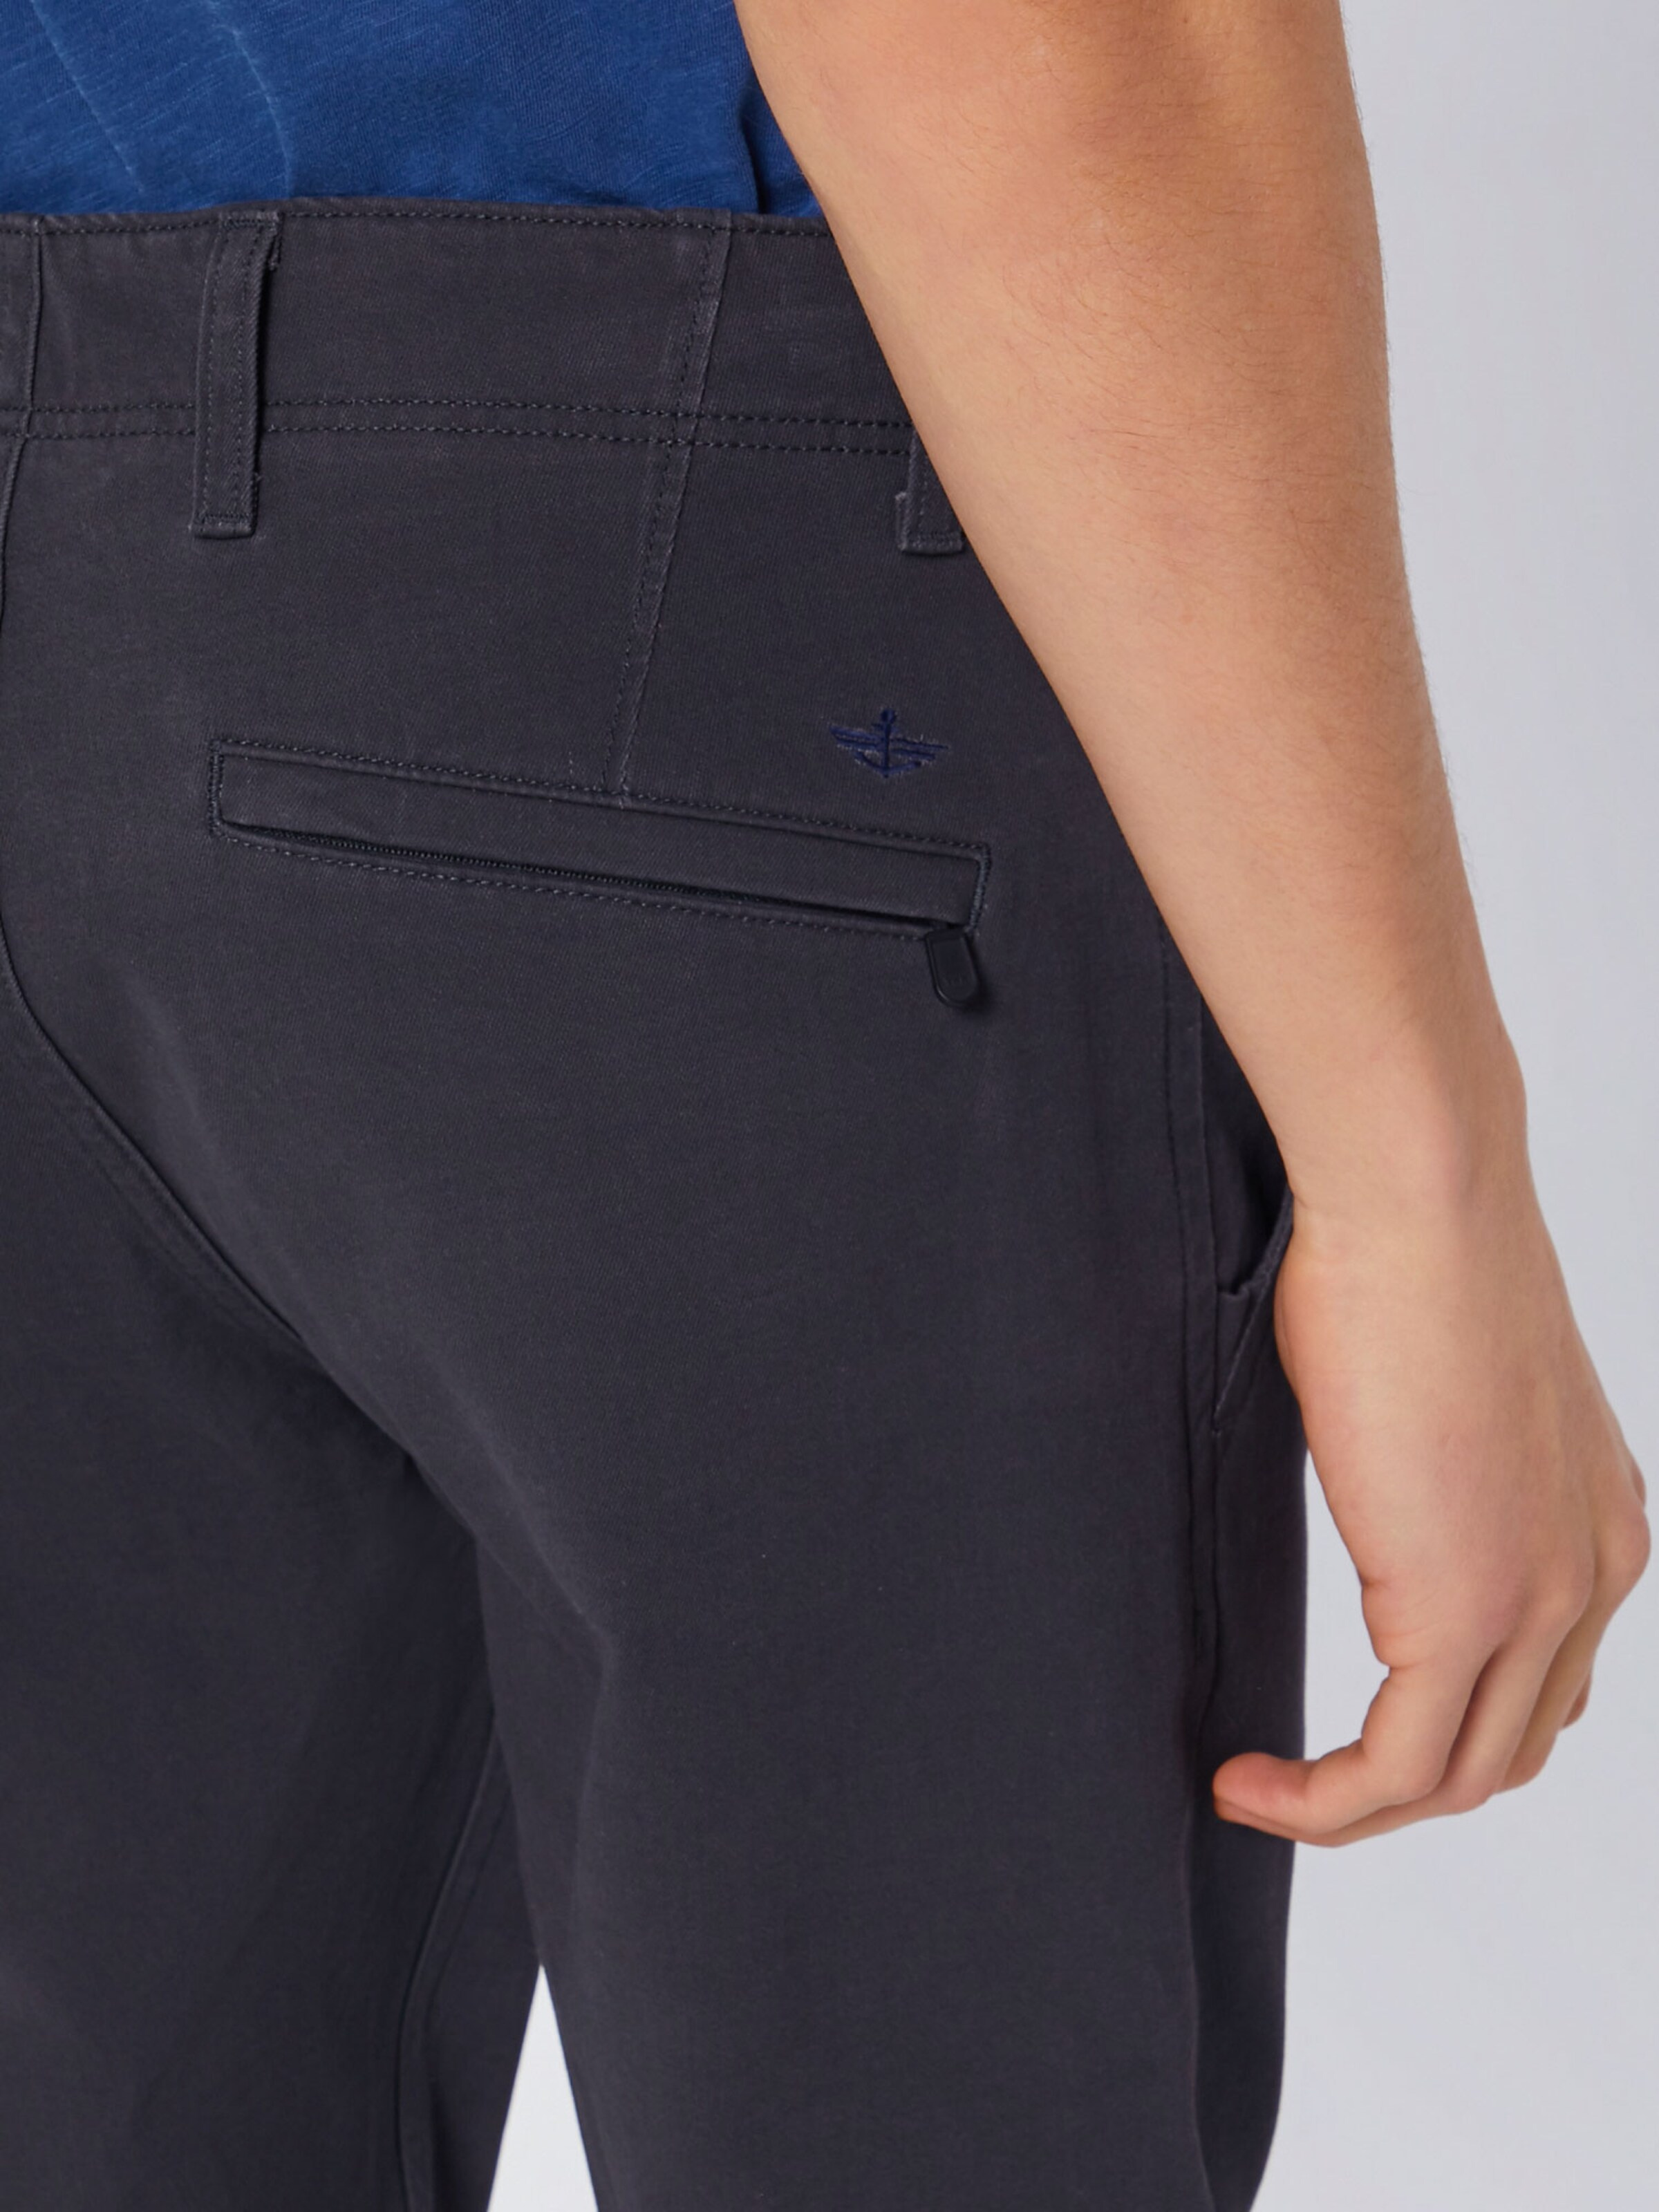 Gris Pantalon Dockers Slimtapered 360 ' Alpha Flex 'smart En lJT1FKc